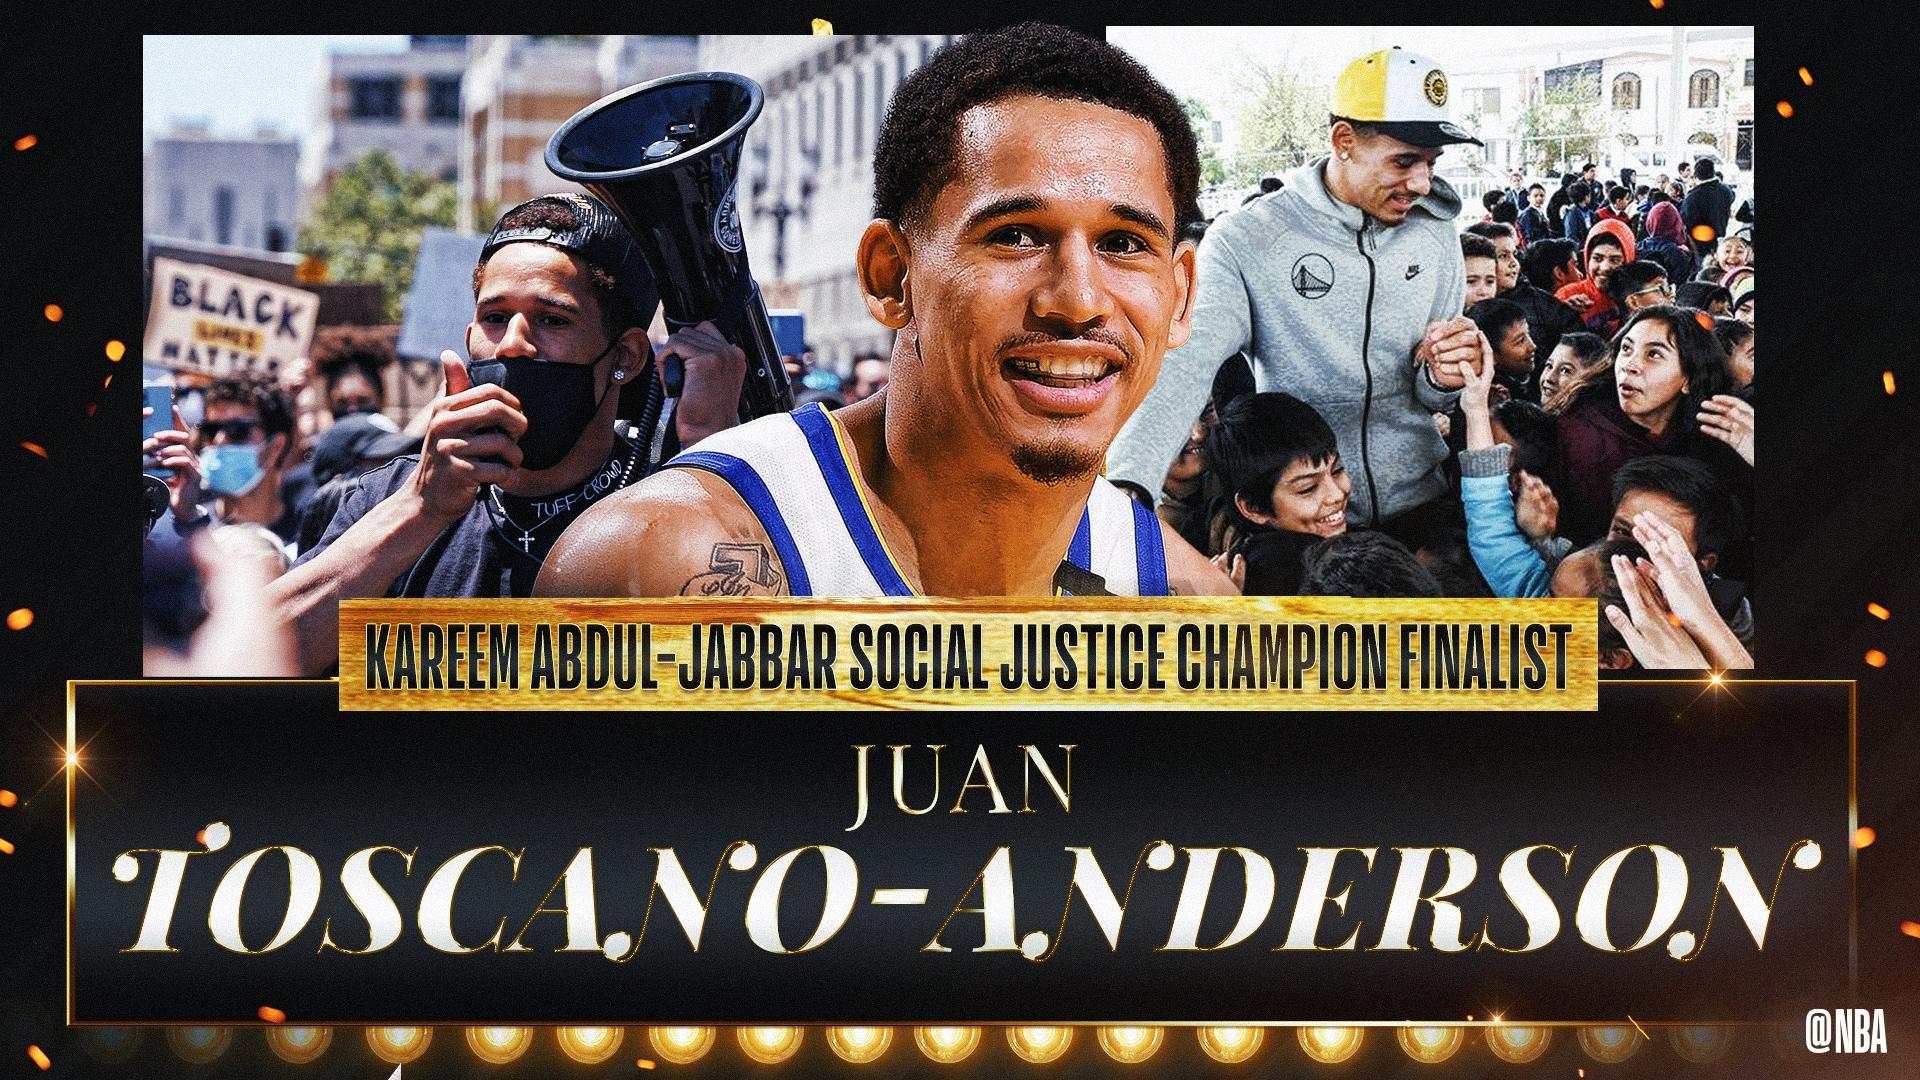 Kareem Abdul-Jabbar Social Justice Champion Finalist: Juan Toscano-Anderson